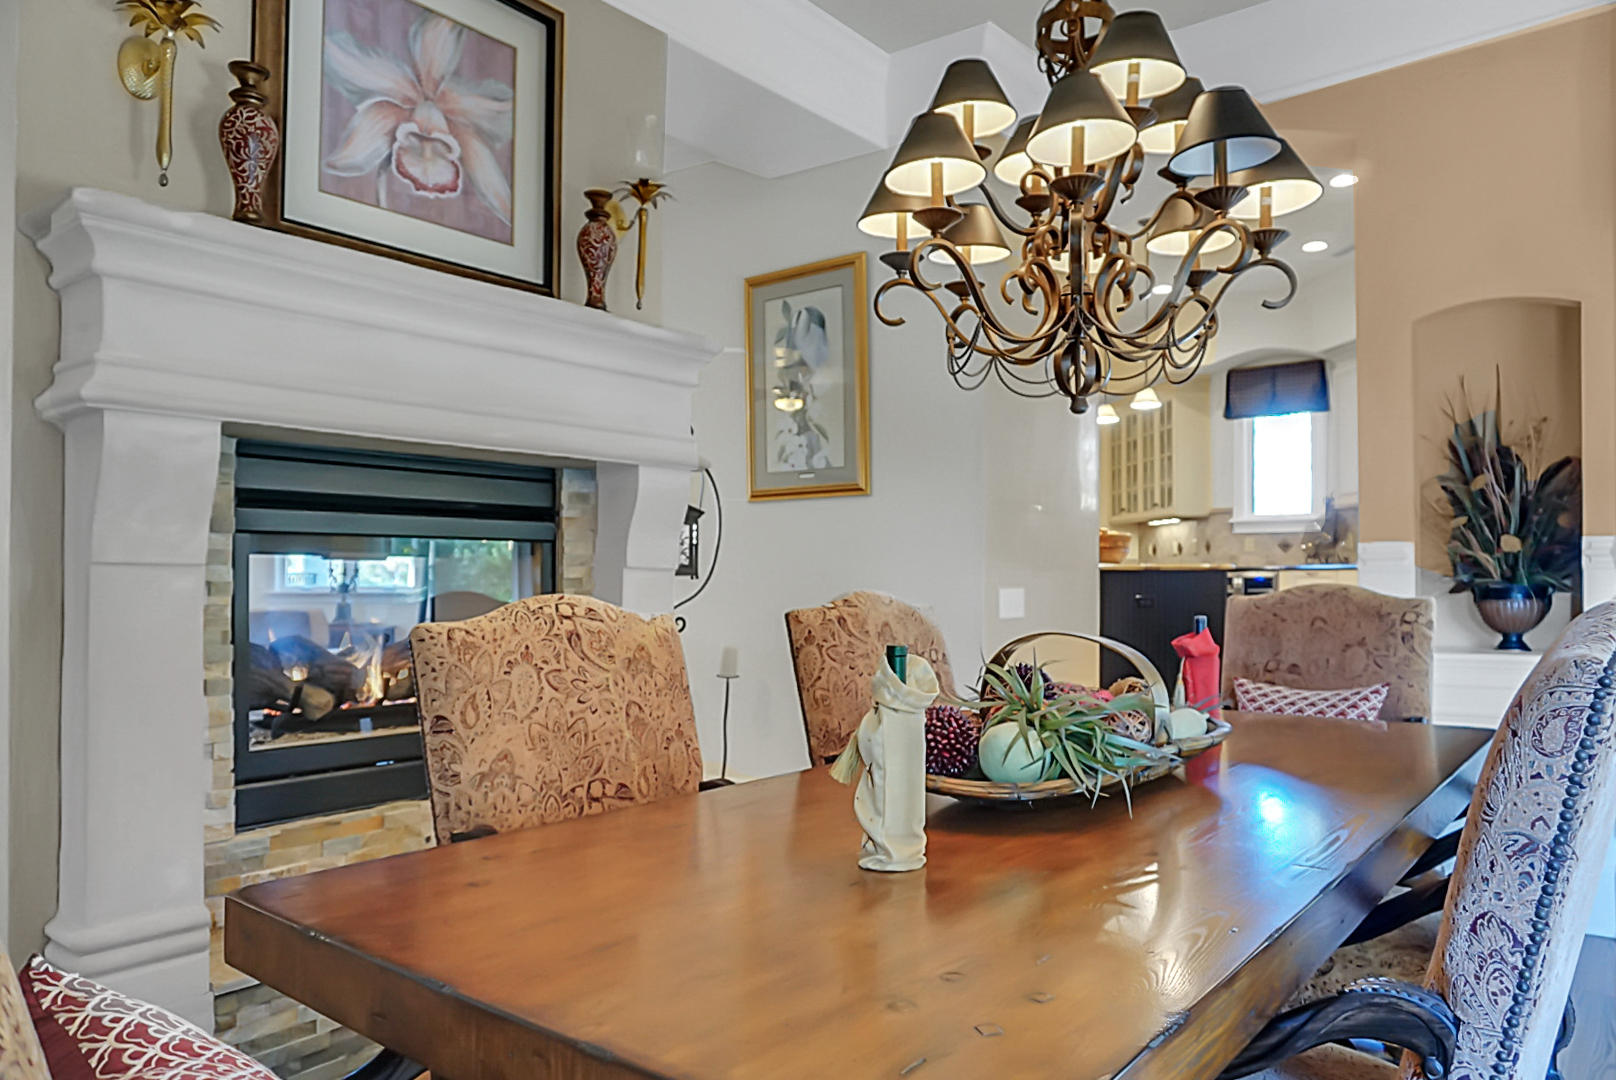 Dunes West Homes For Sale - 2389 Darts Cove, Mount Pleasant, SC - 40